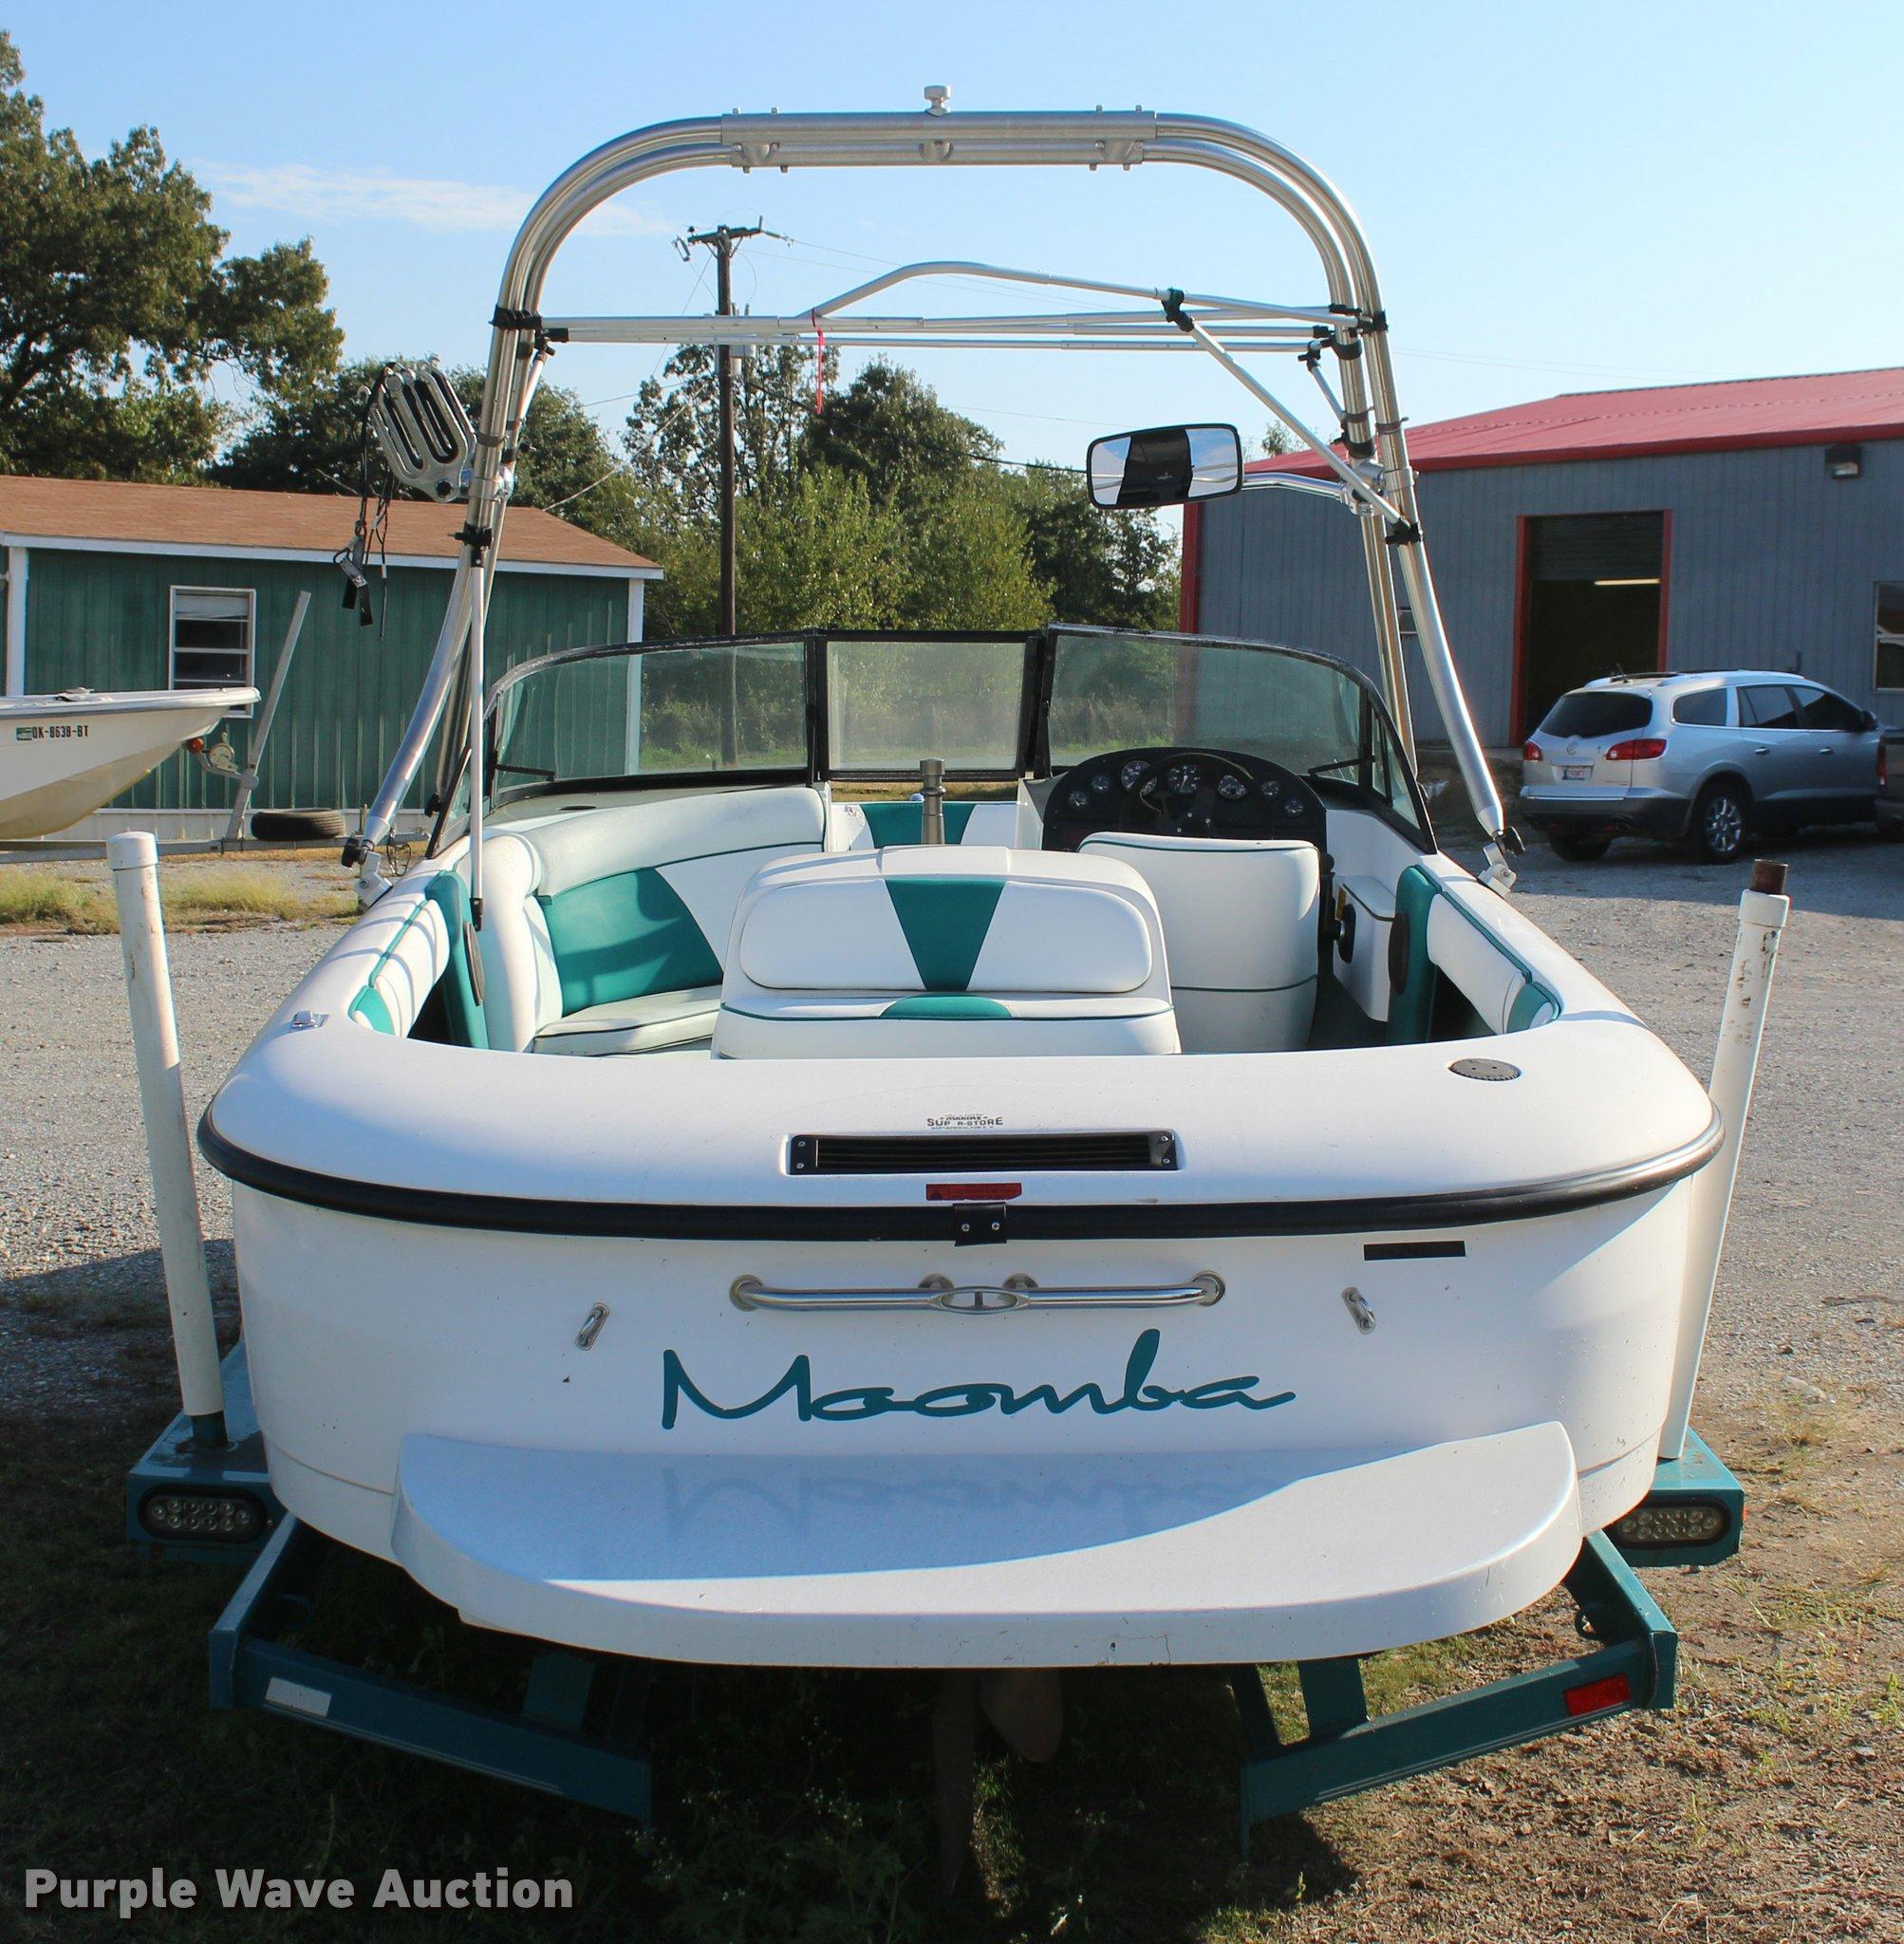 ... 1997 Moomba Outback ski boat Full size in new window ...